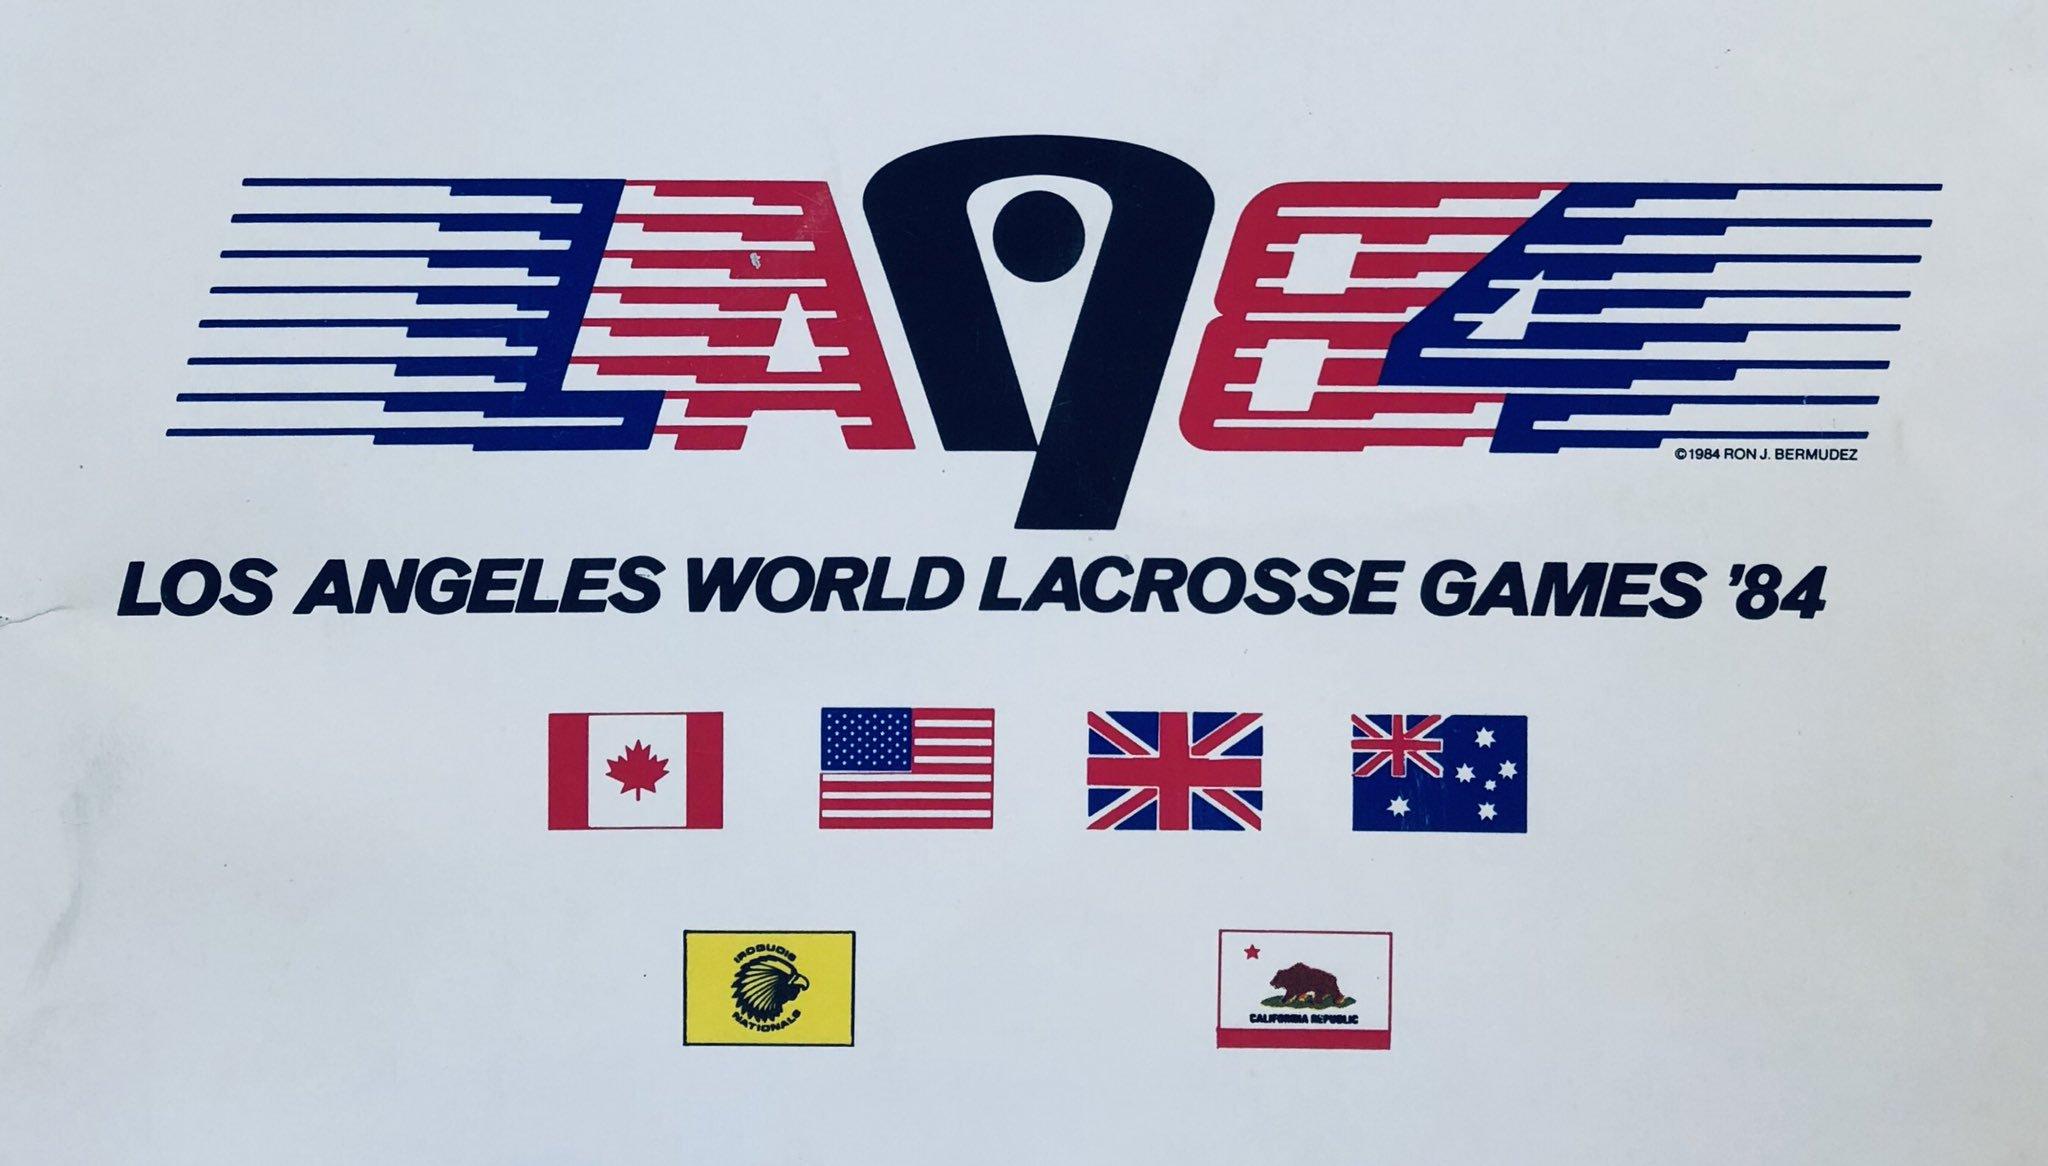 LOS ANGELES WORLD LACROSSE GAMES (1984)